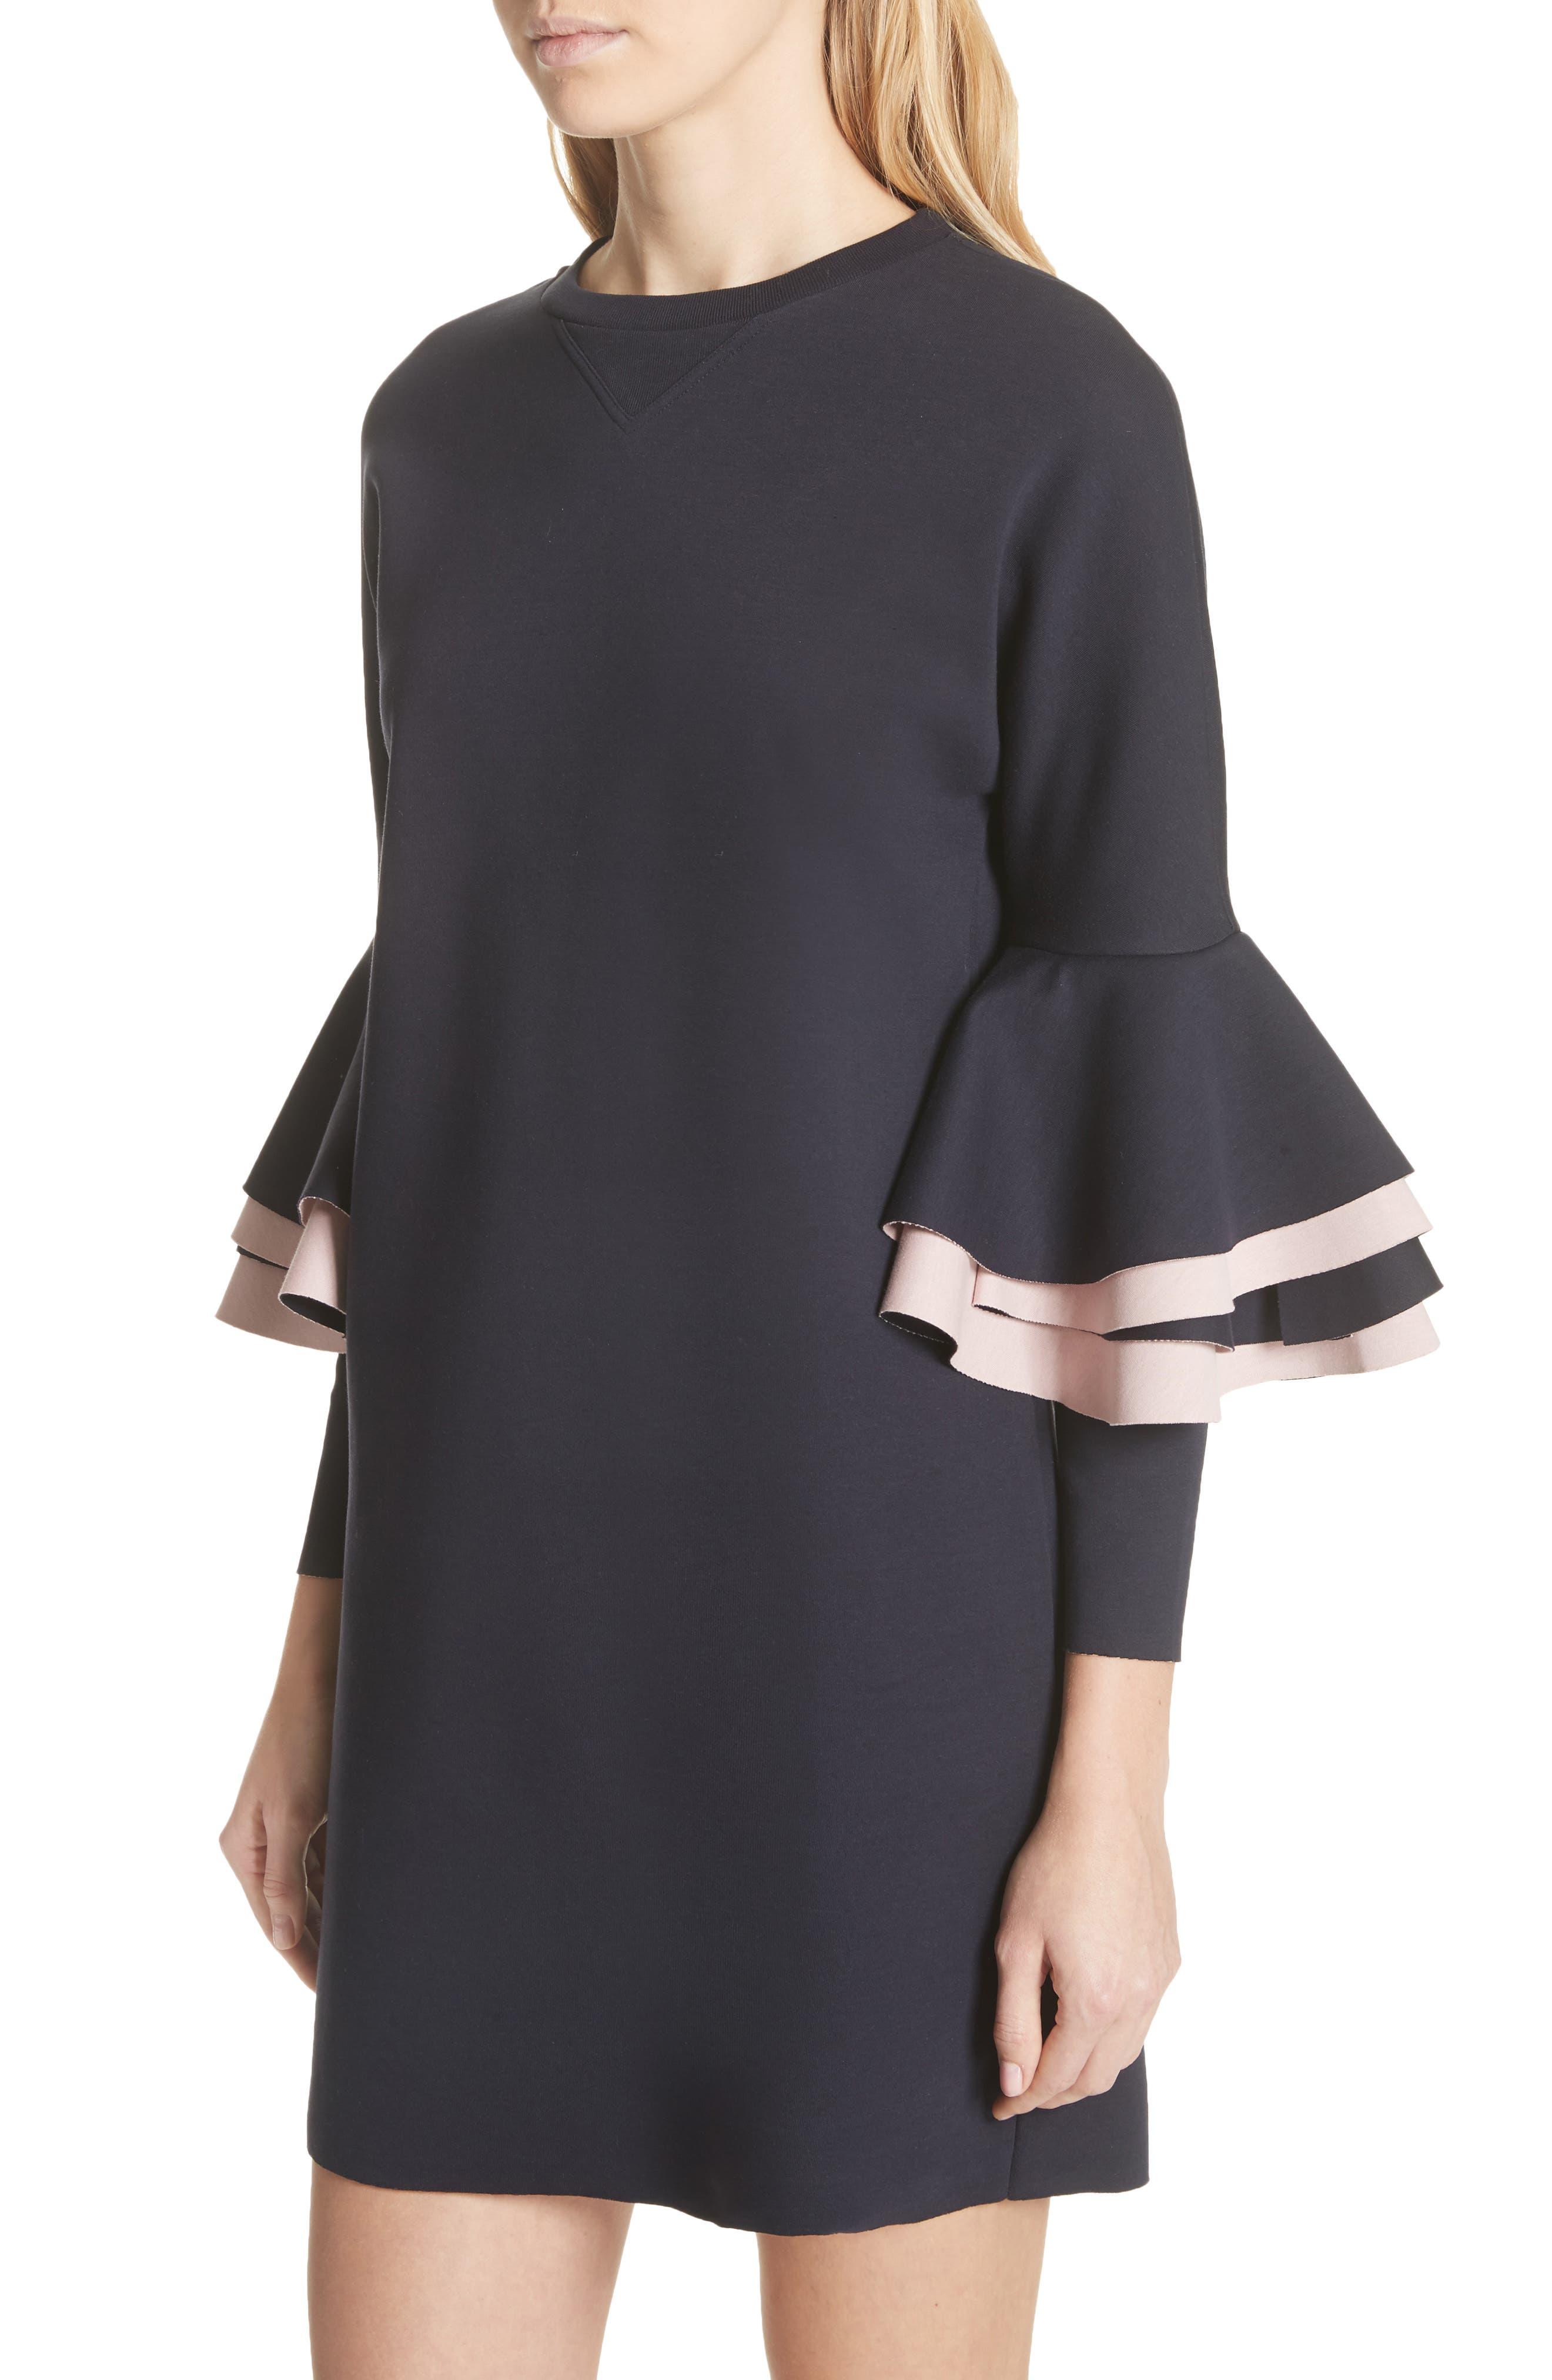 Chloae Frill Sleeve Sweatshirt Dress,                             Alternate thumbnail 4, color,                             Navy